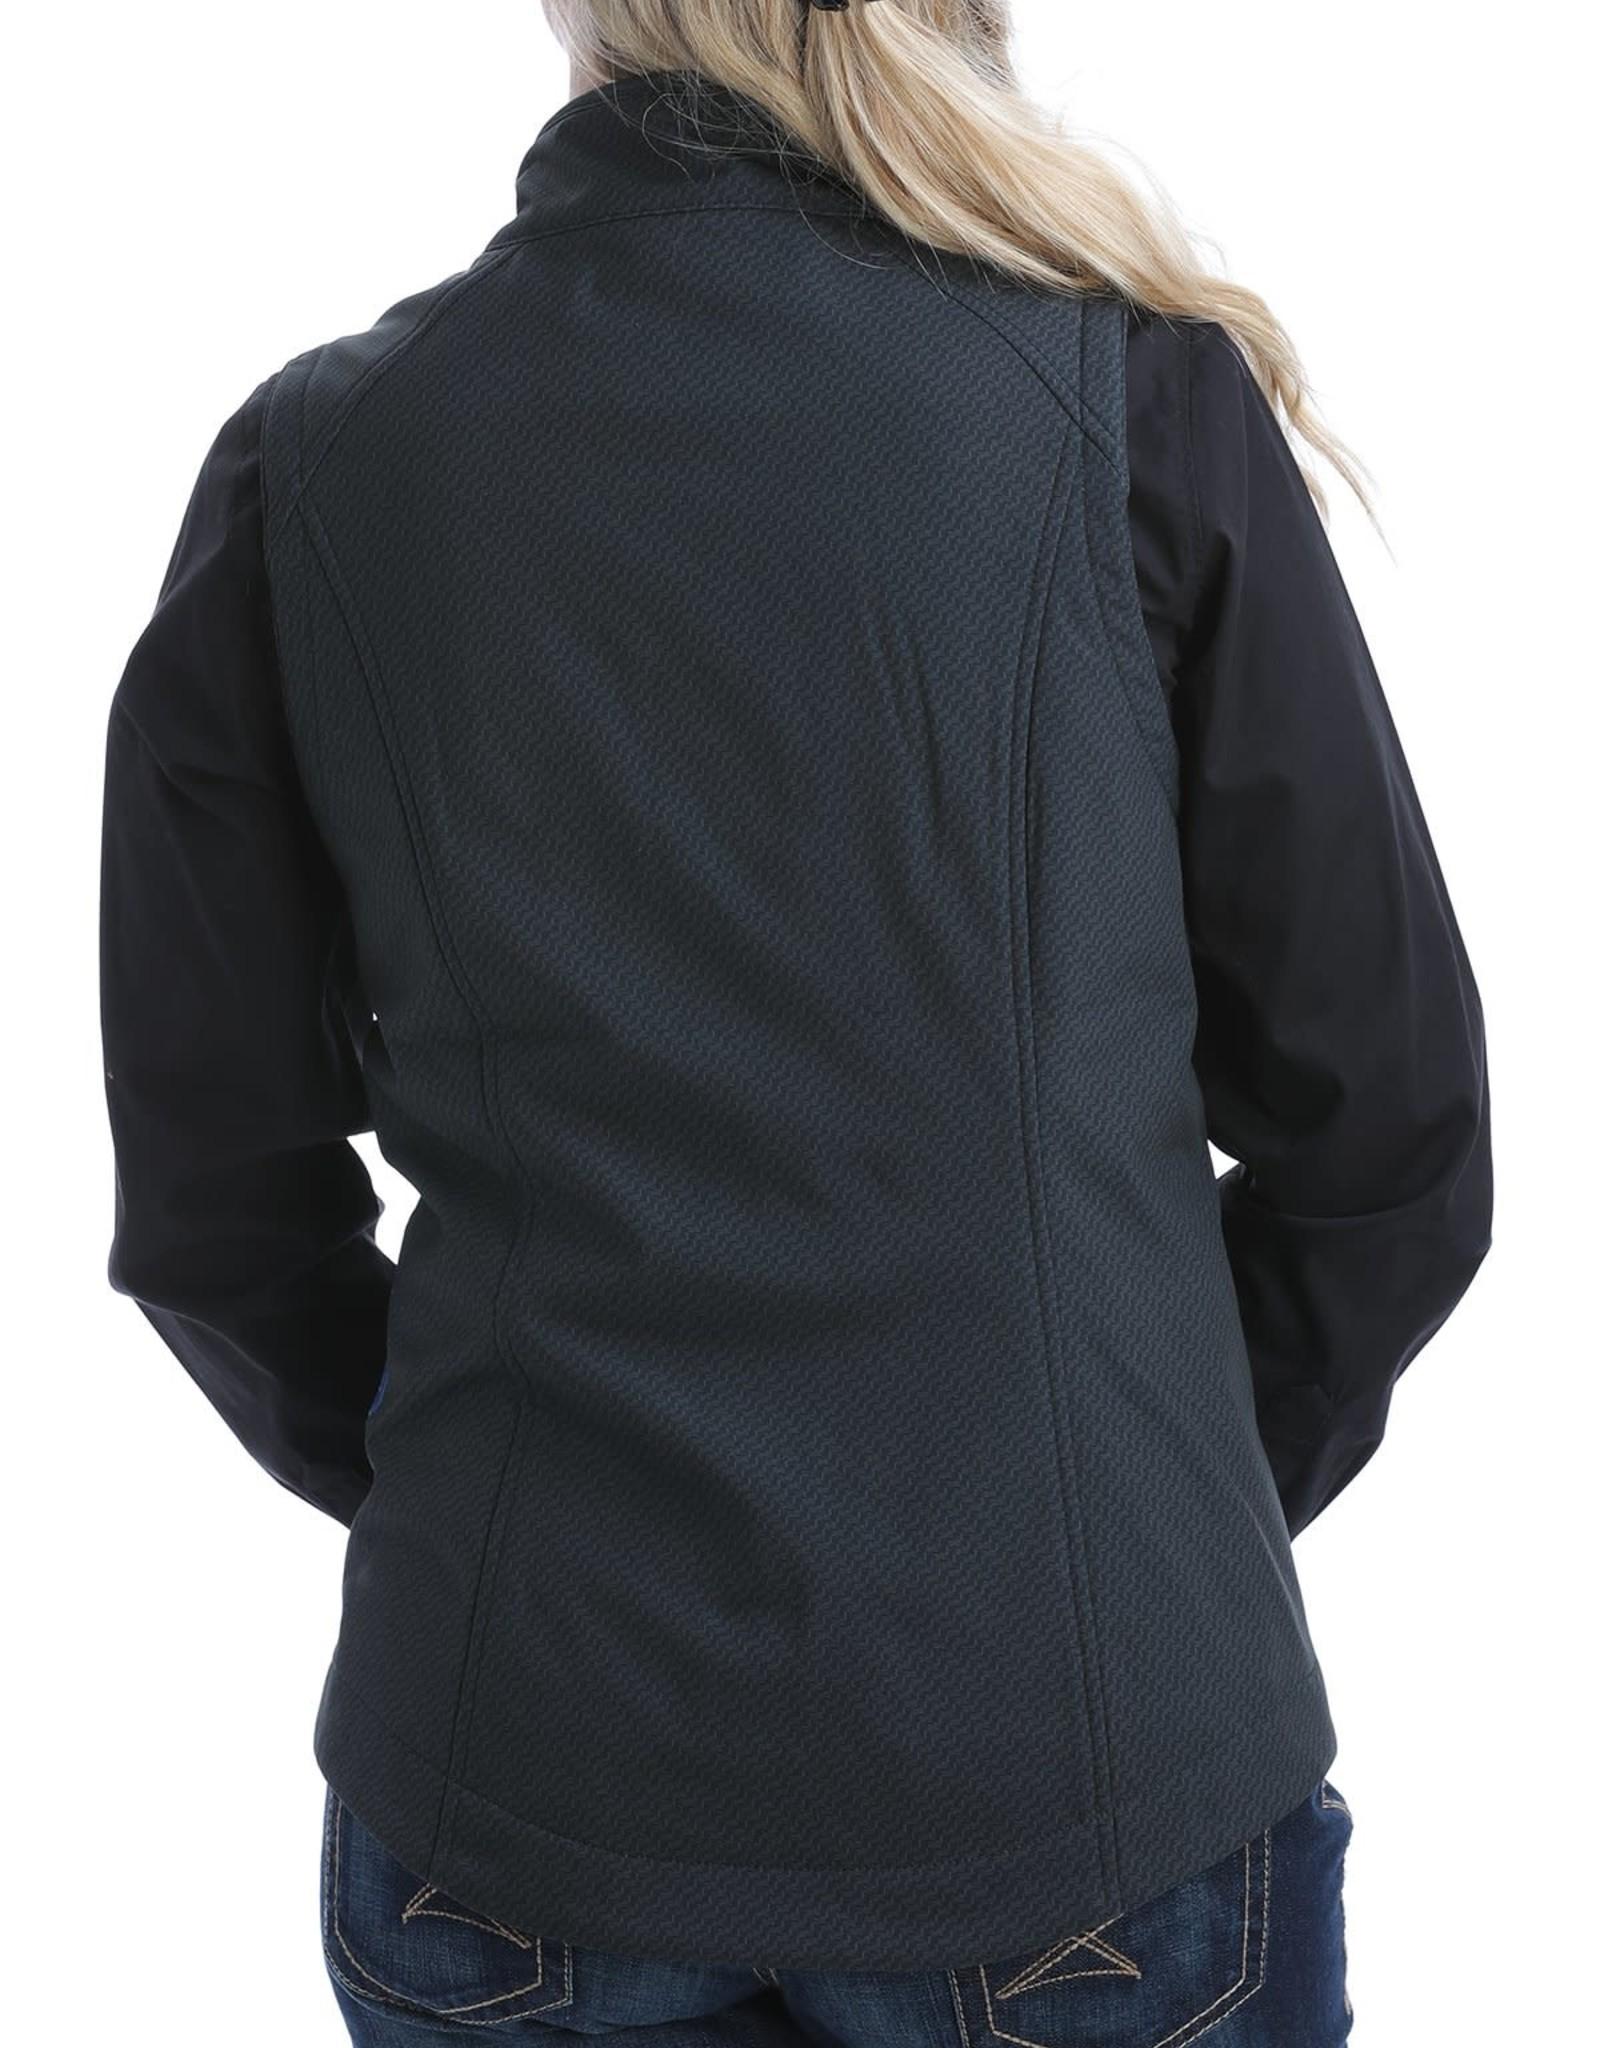 Cinch Womens Cinch Ladies Black and Royal Bonded Vest